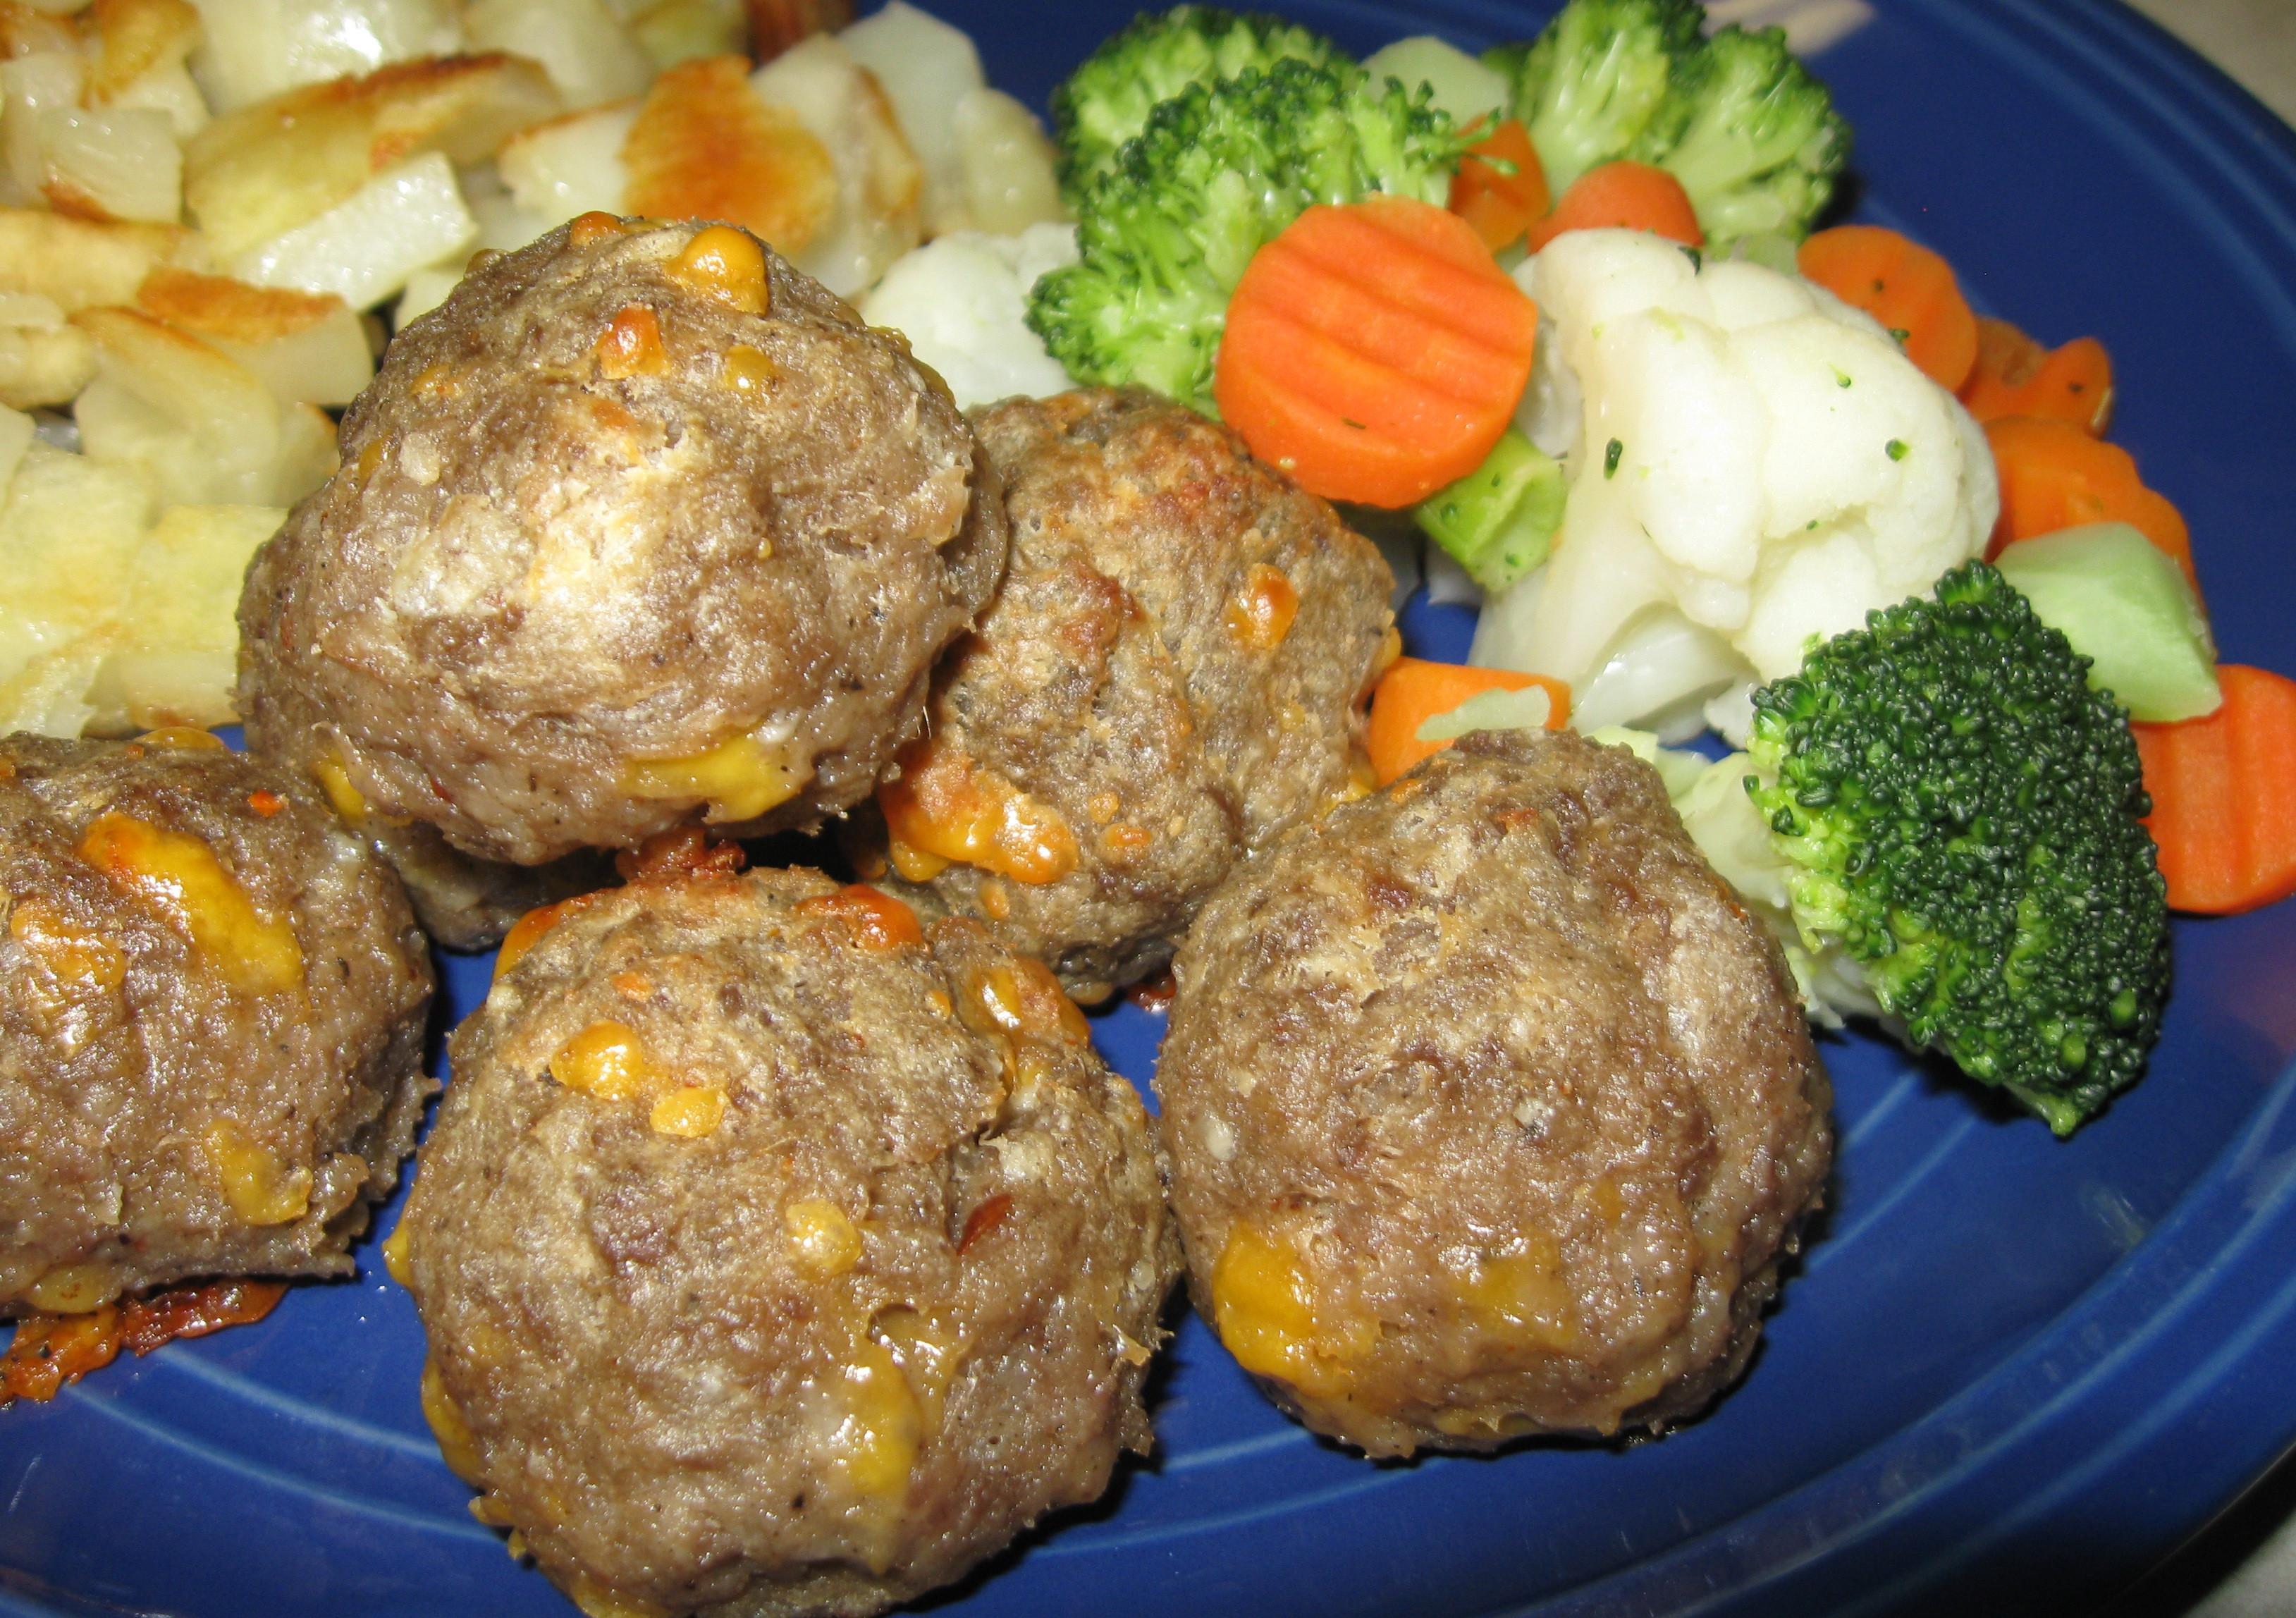 Venison Breakfast Sausage Recipes  venison sausage meatballs